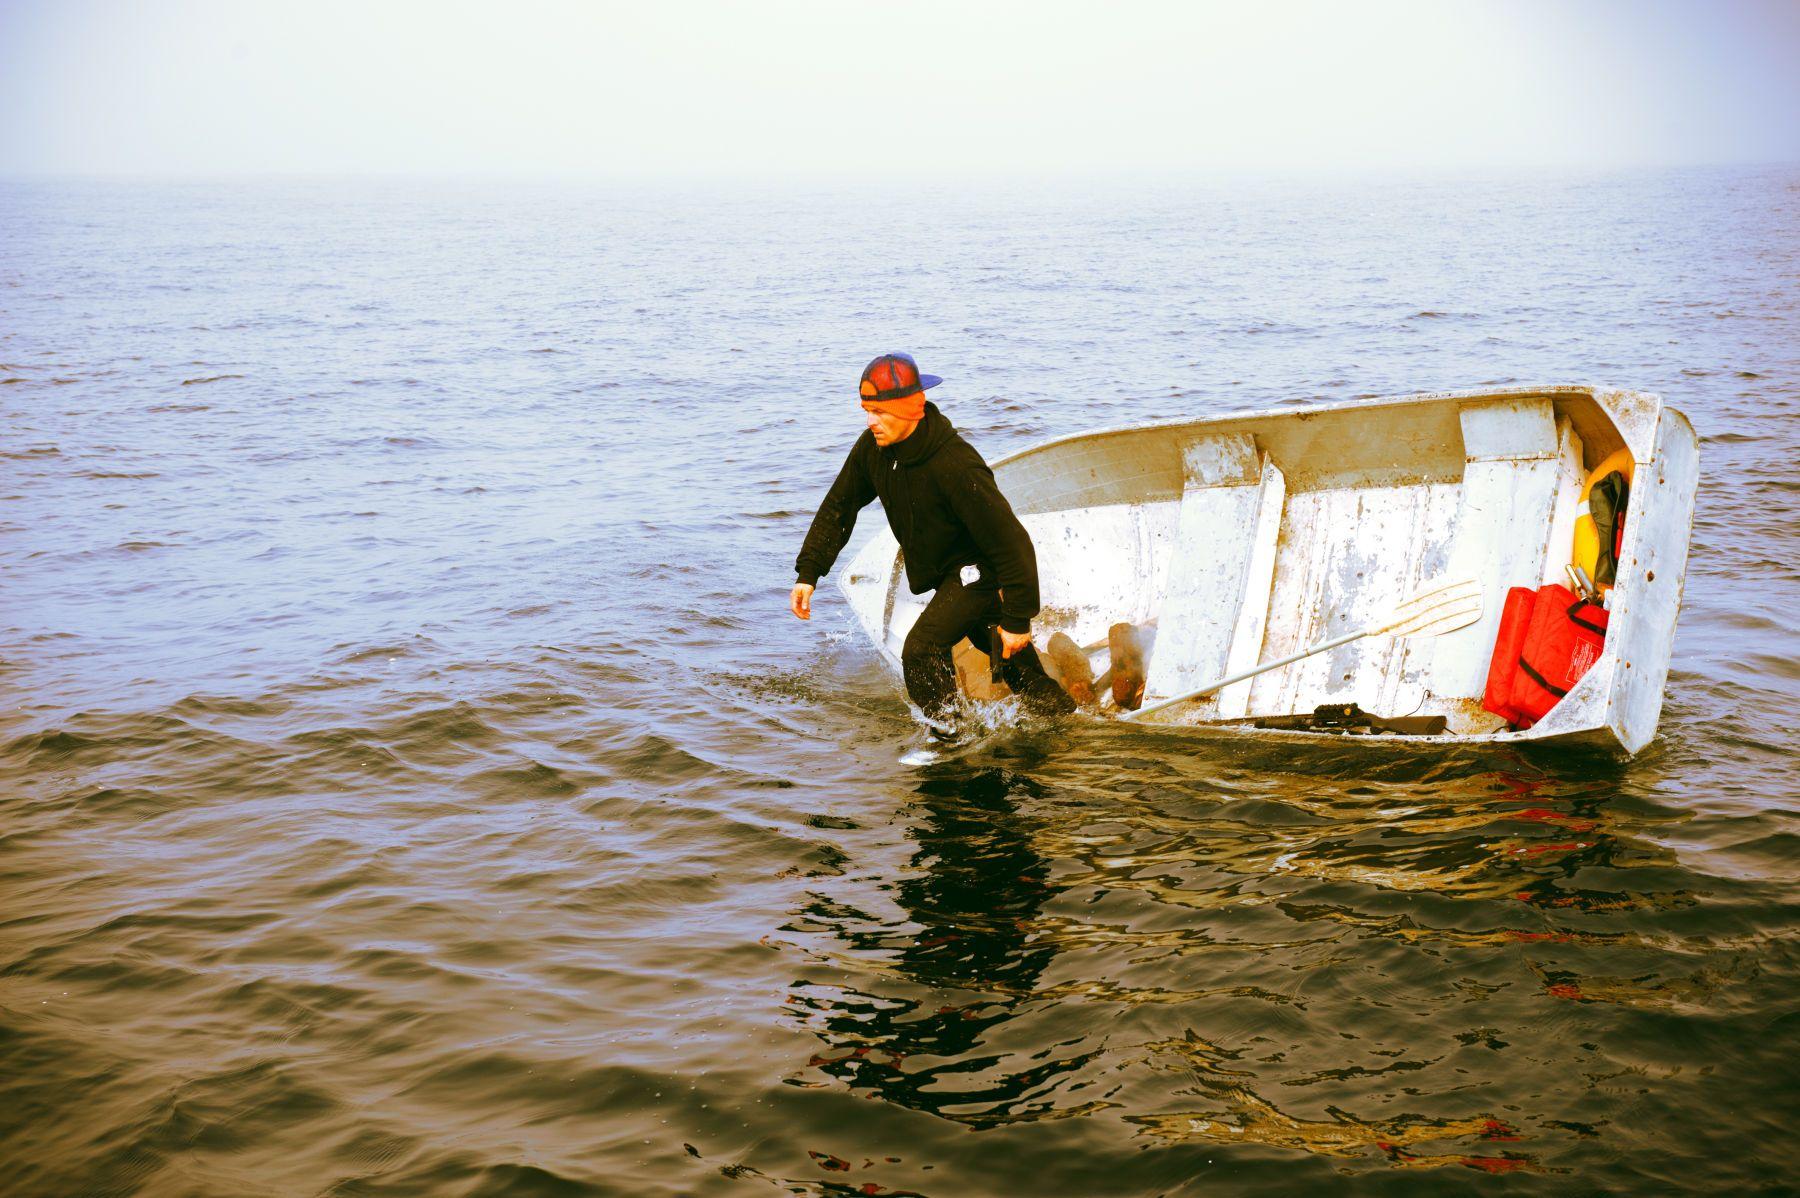 1jason_jessee_boat_stepper_sc_s_c_2012_omeally